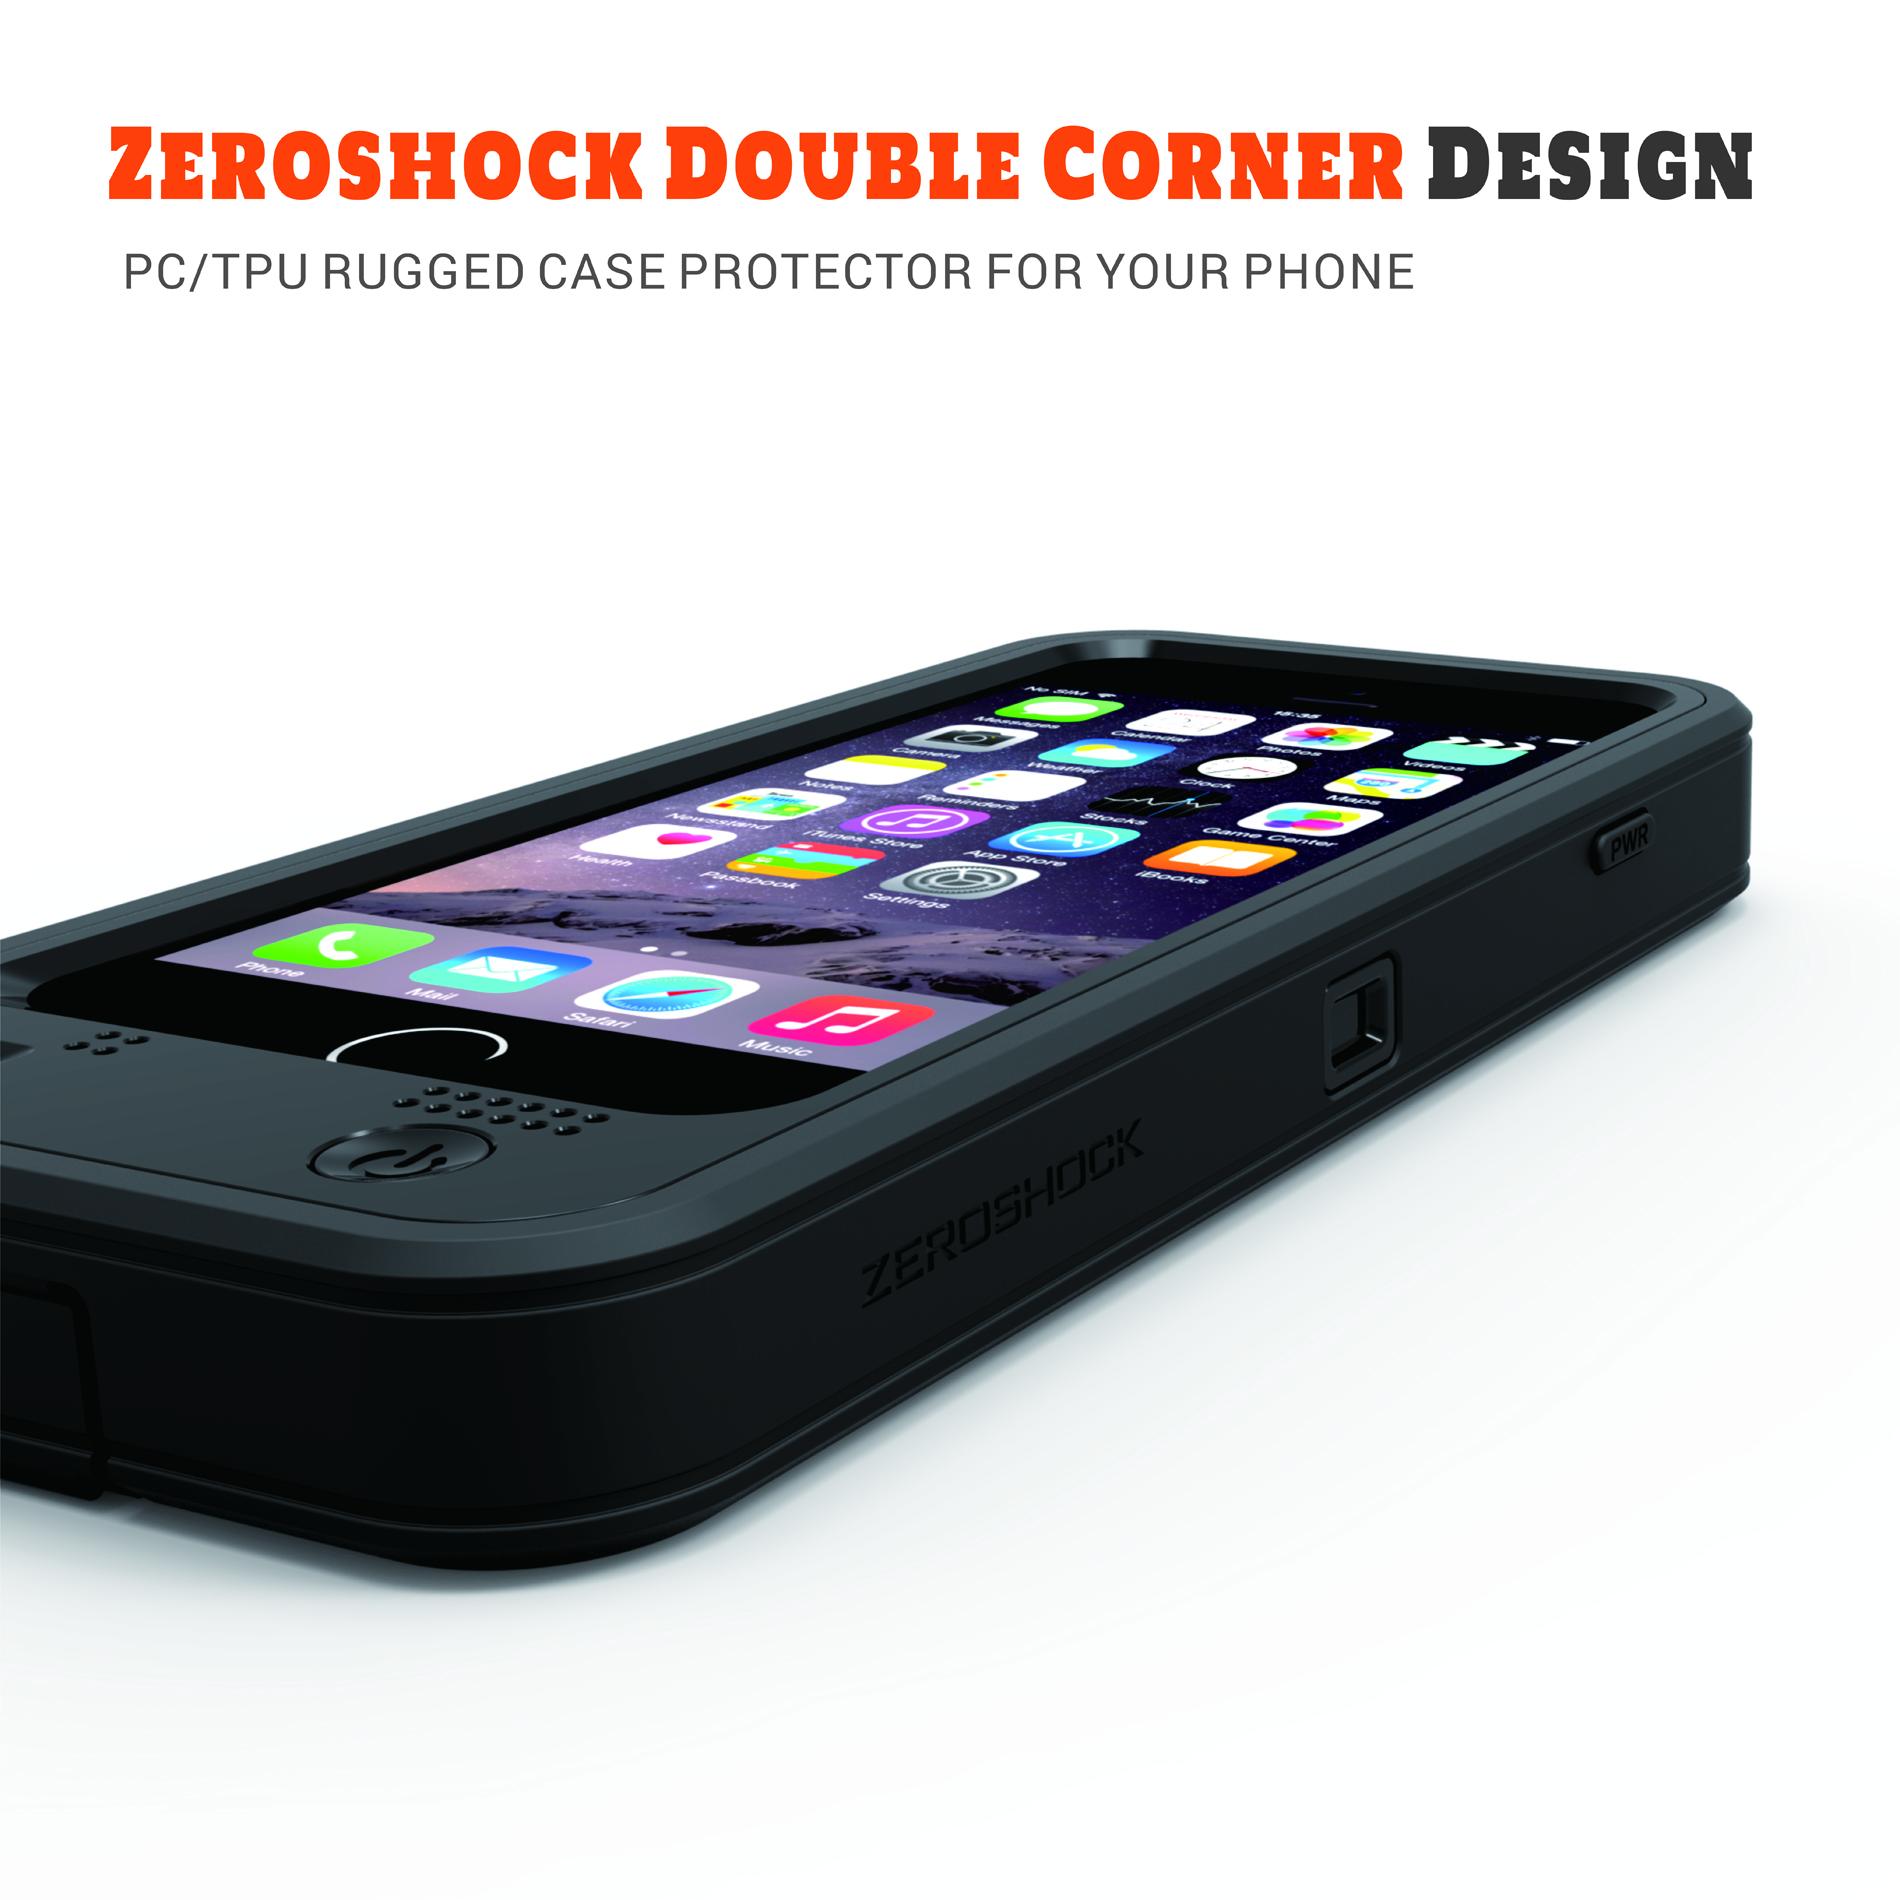 iphone 6 6s plus rugged case 9000mah zerolemon. Black Bedroom Furniture Sets. Home Design Ideas